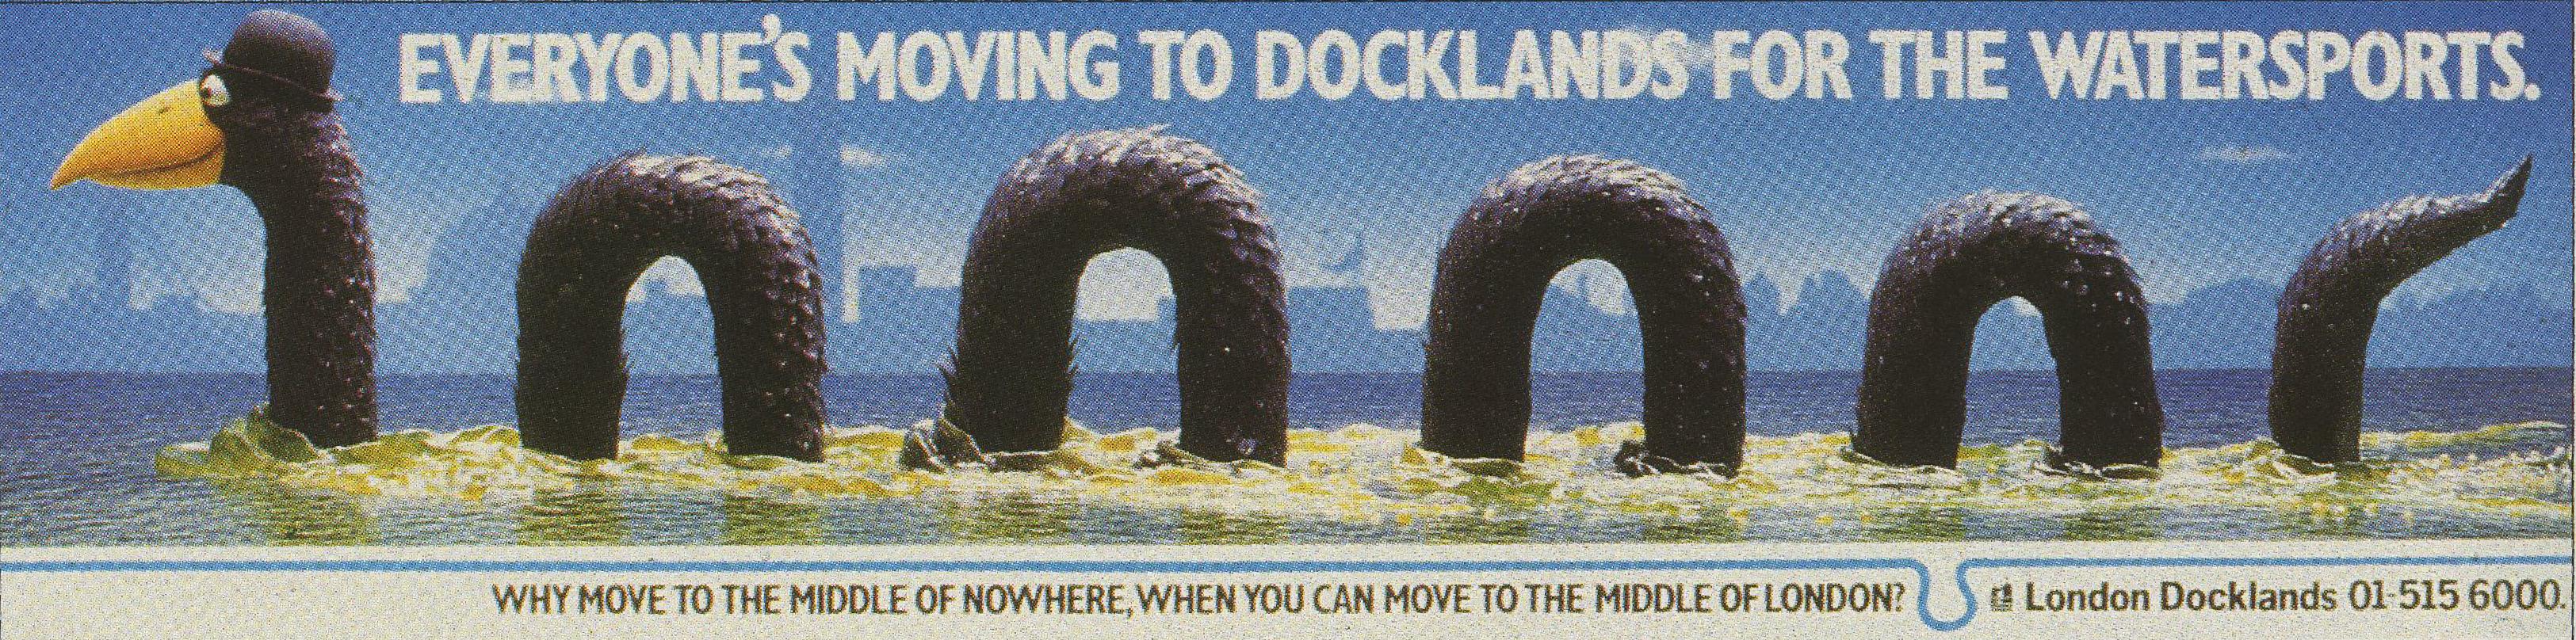 London Docklands 'Nessie Trott-01